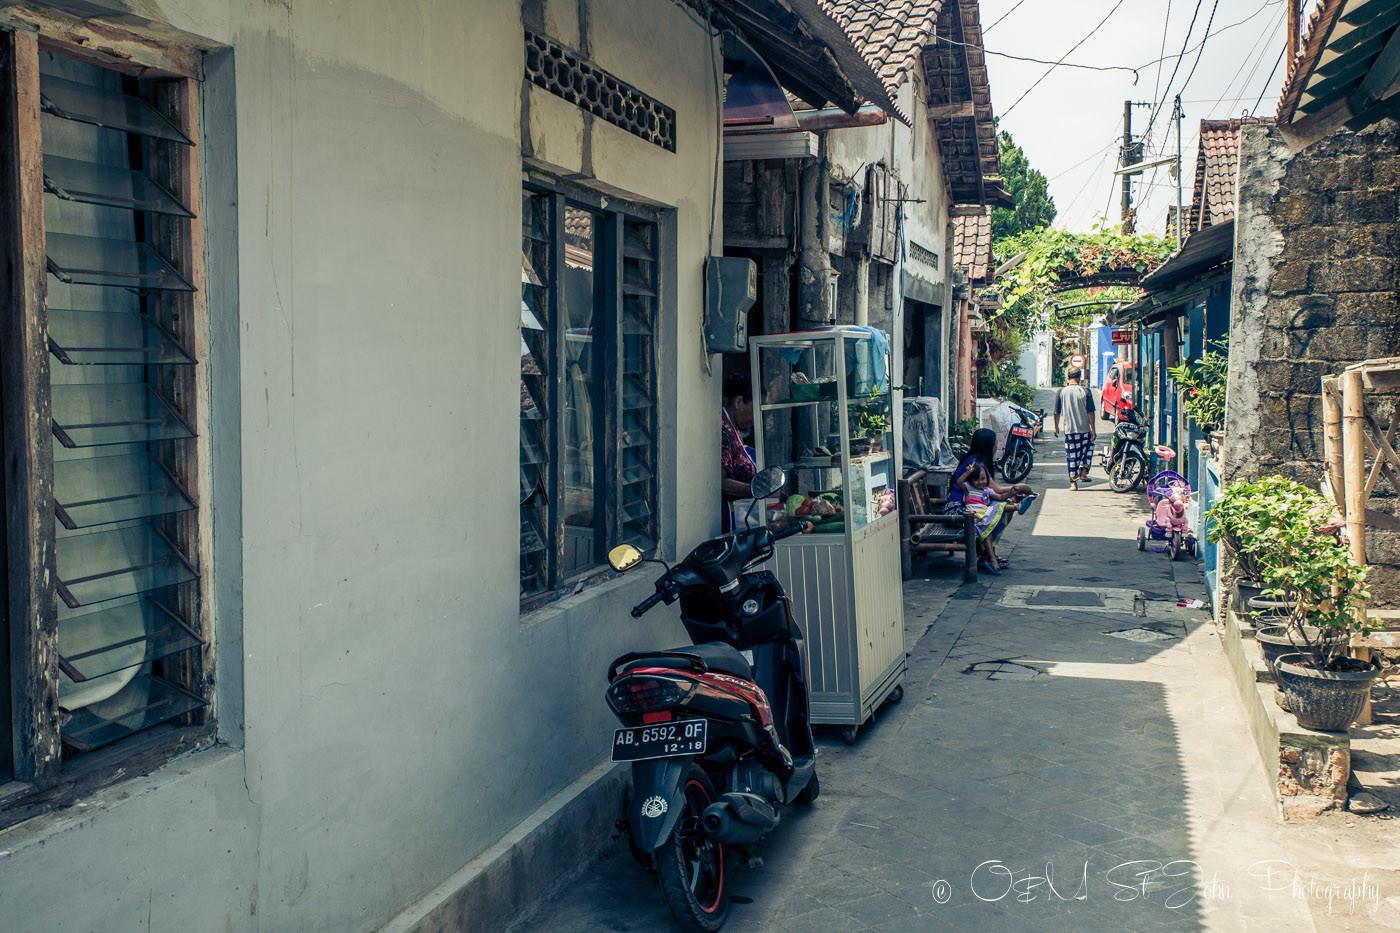 Things to do in , Yogyakarta. Indonesia visit small streets near Taman Sari